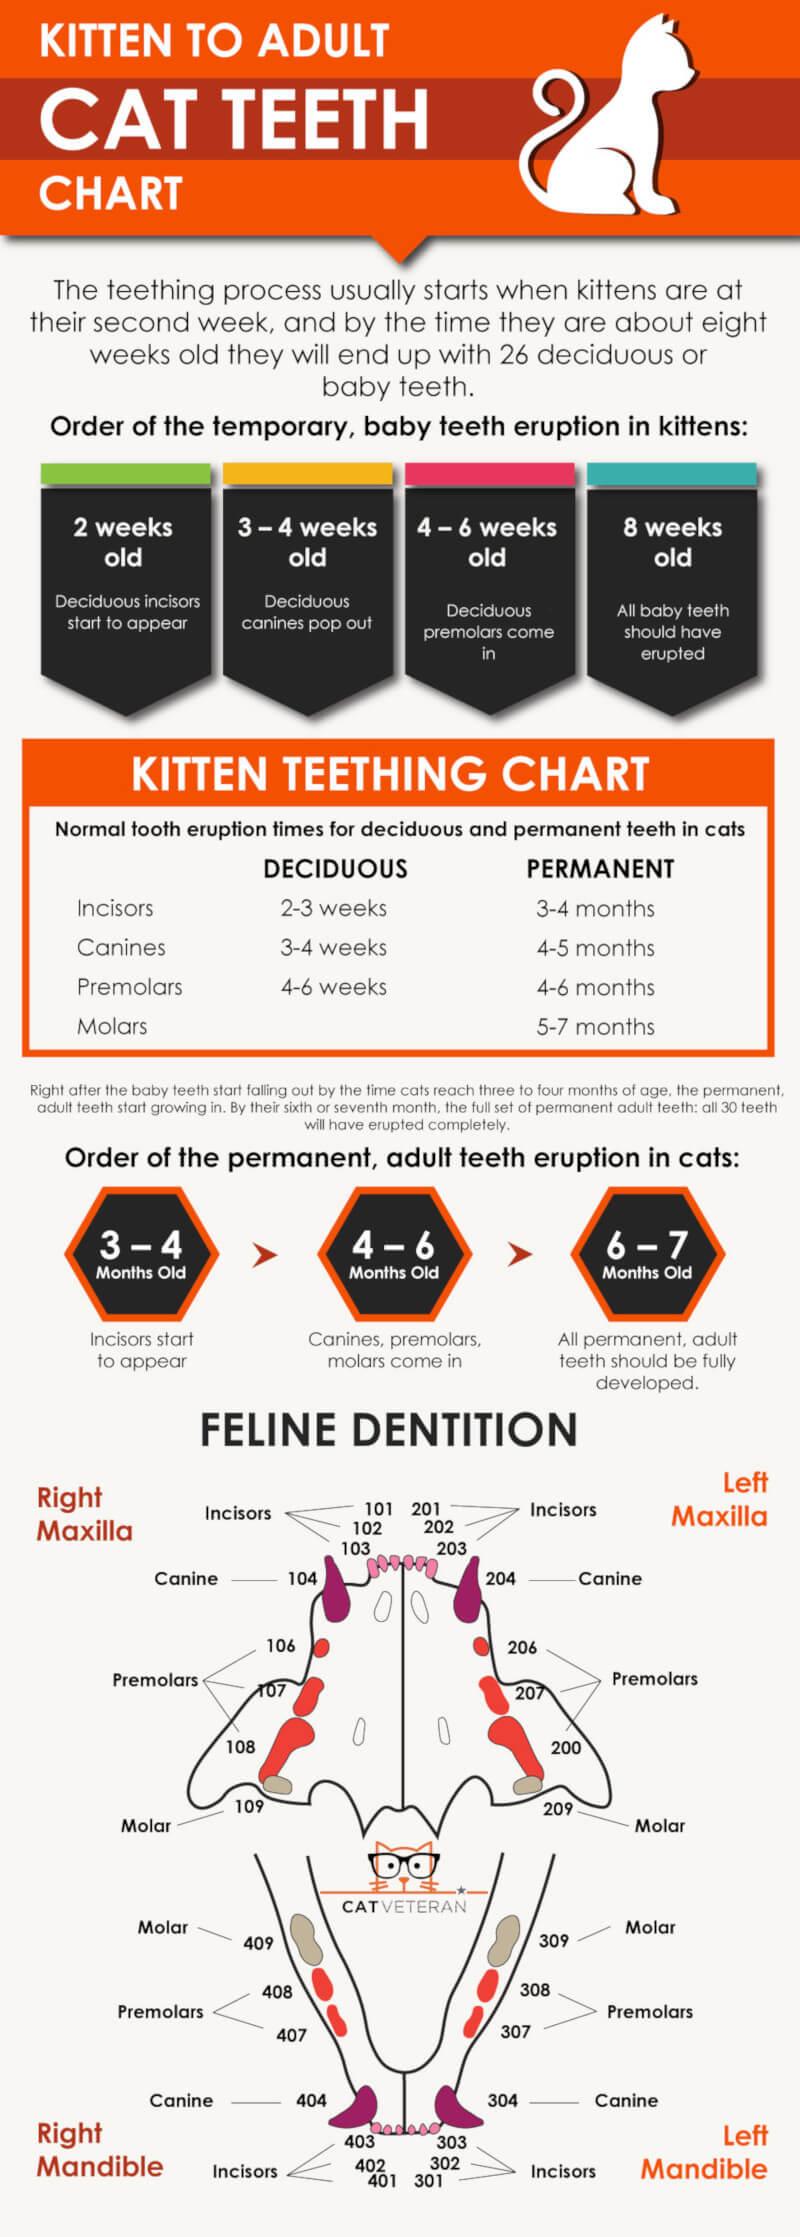 Cat Teeth Chart